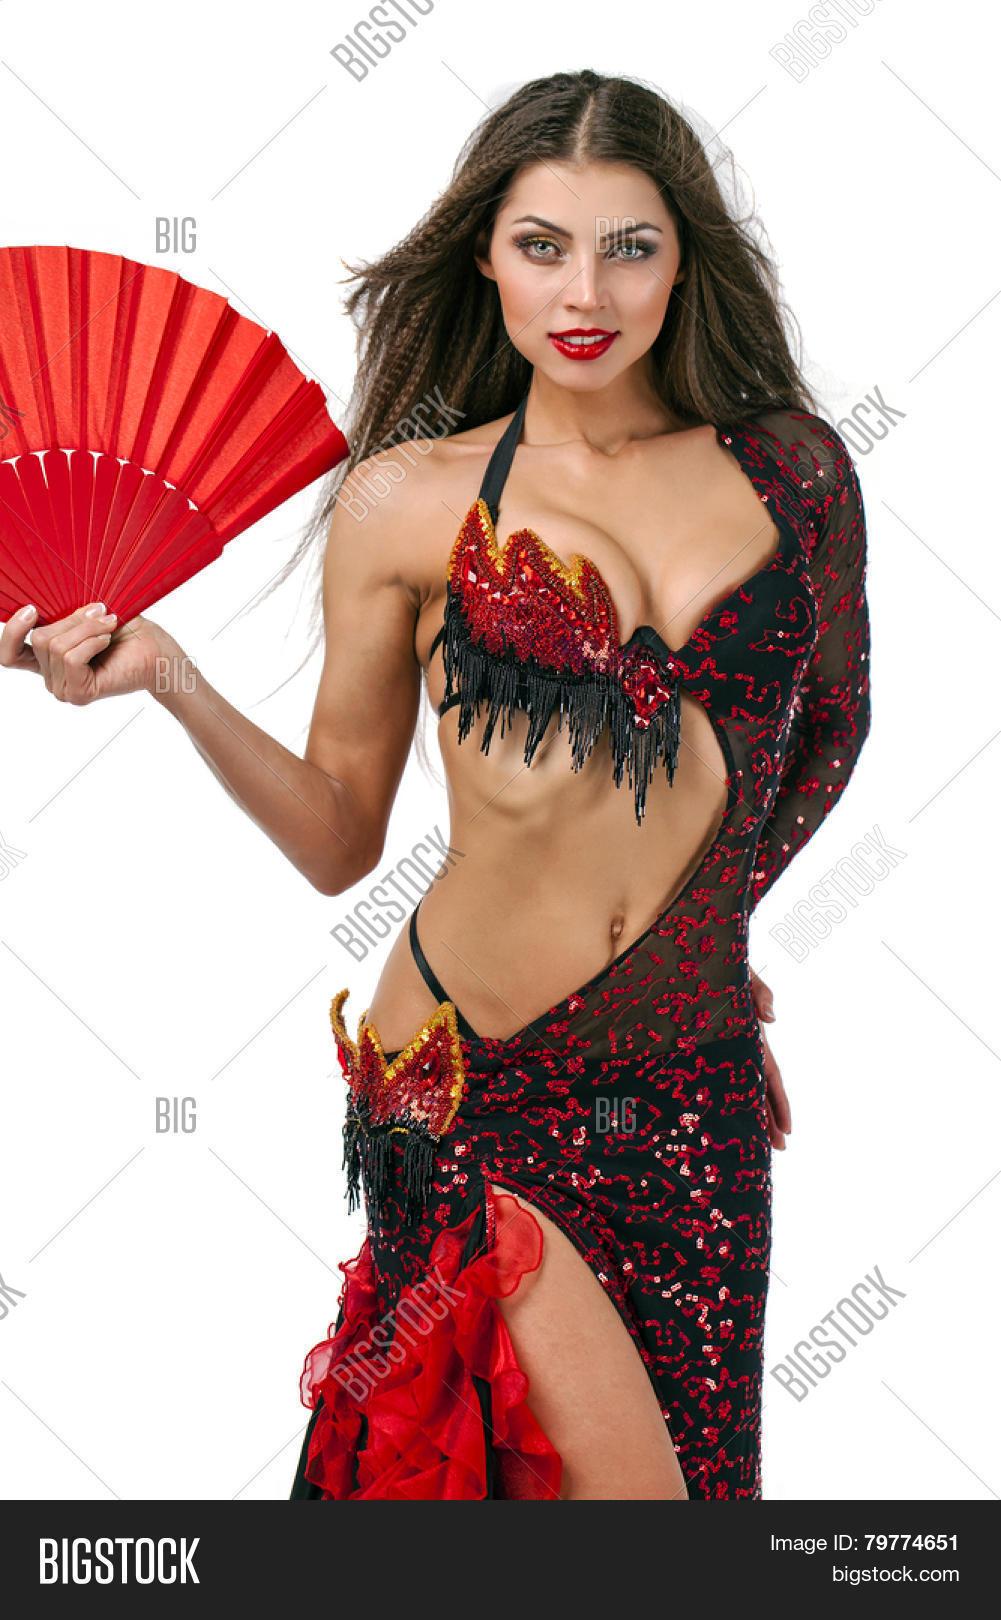 woman traditional spanish image u0026 photo bigstock